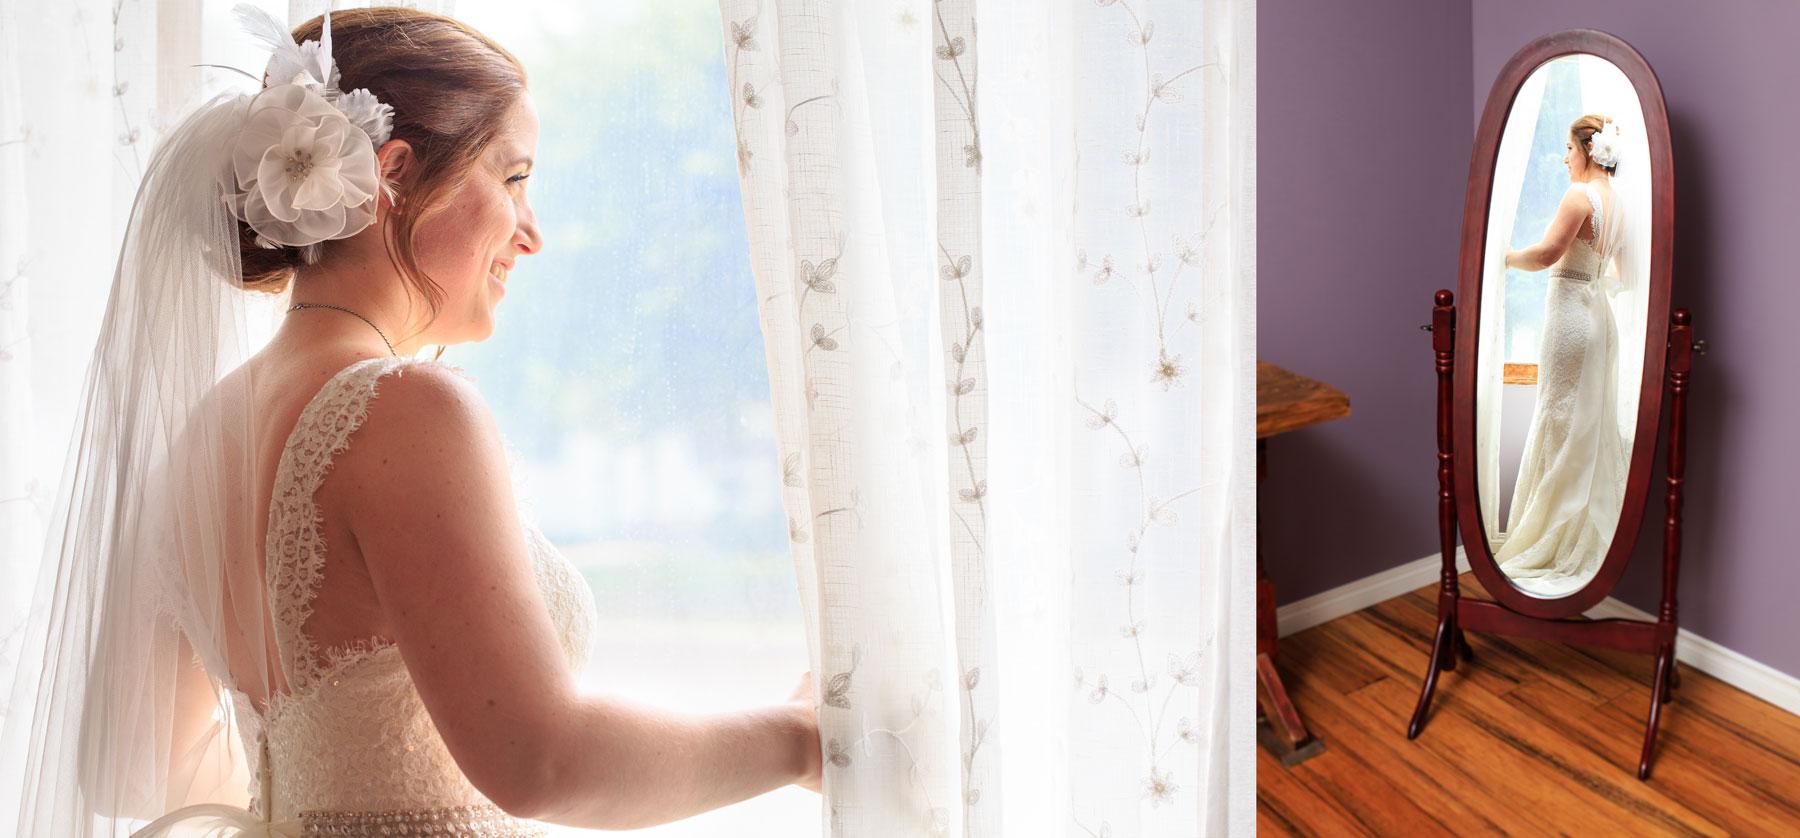 Angela & Patrick - Lacombe, Alberta Wedding Photography - Olson Studios (10)